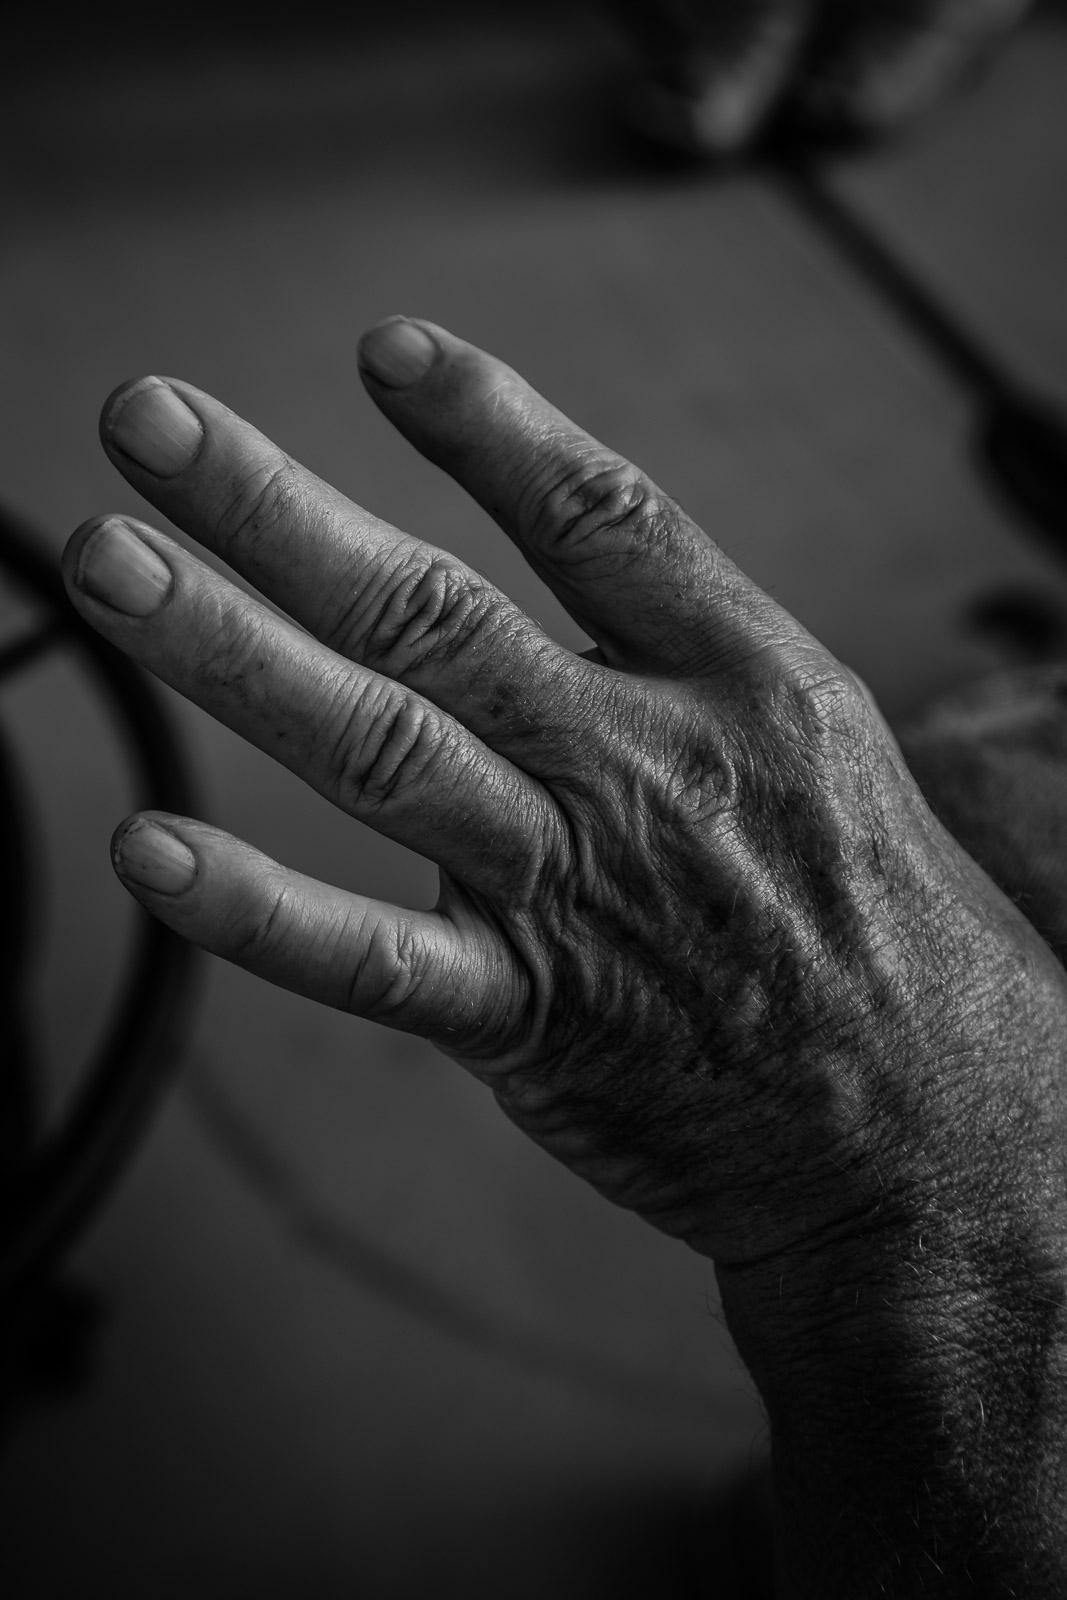 Haydn, the Hand Model